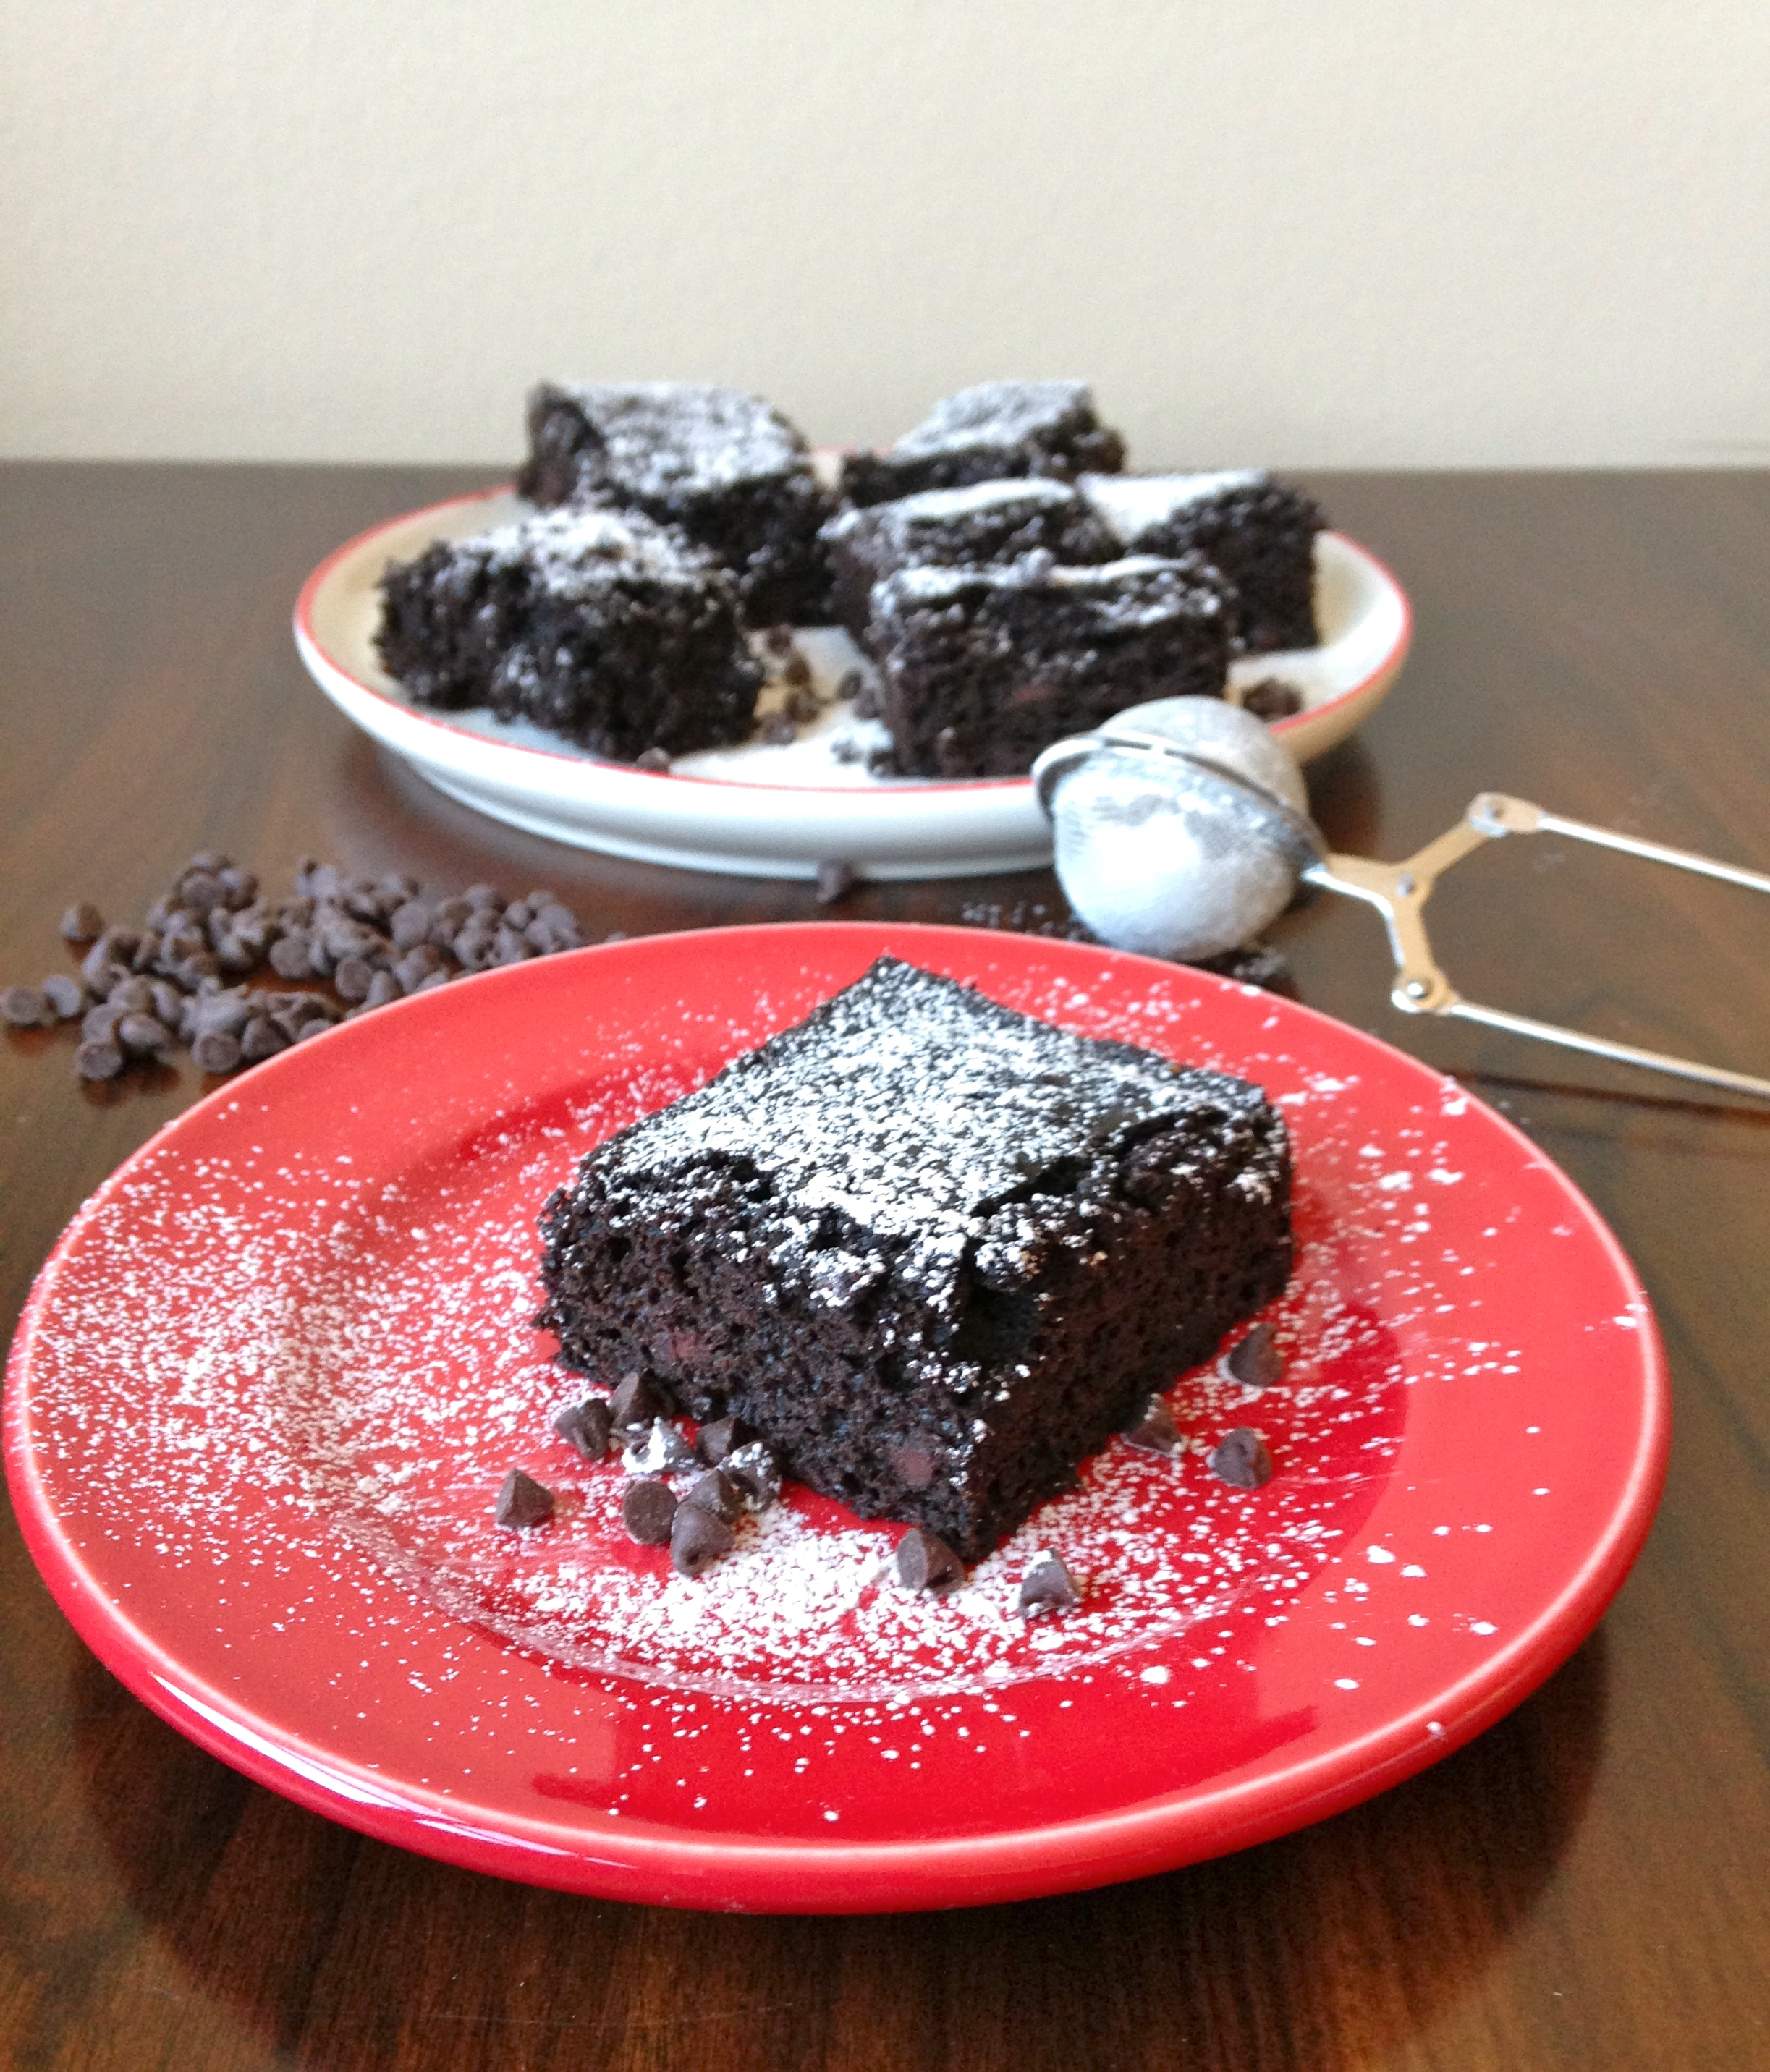 Skinny Chocolate Cake made with Greek Yogurt | chezcateylou.com